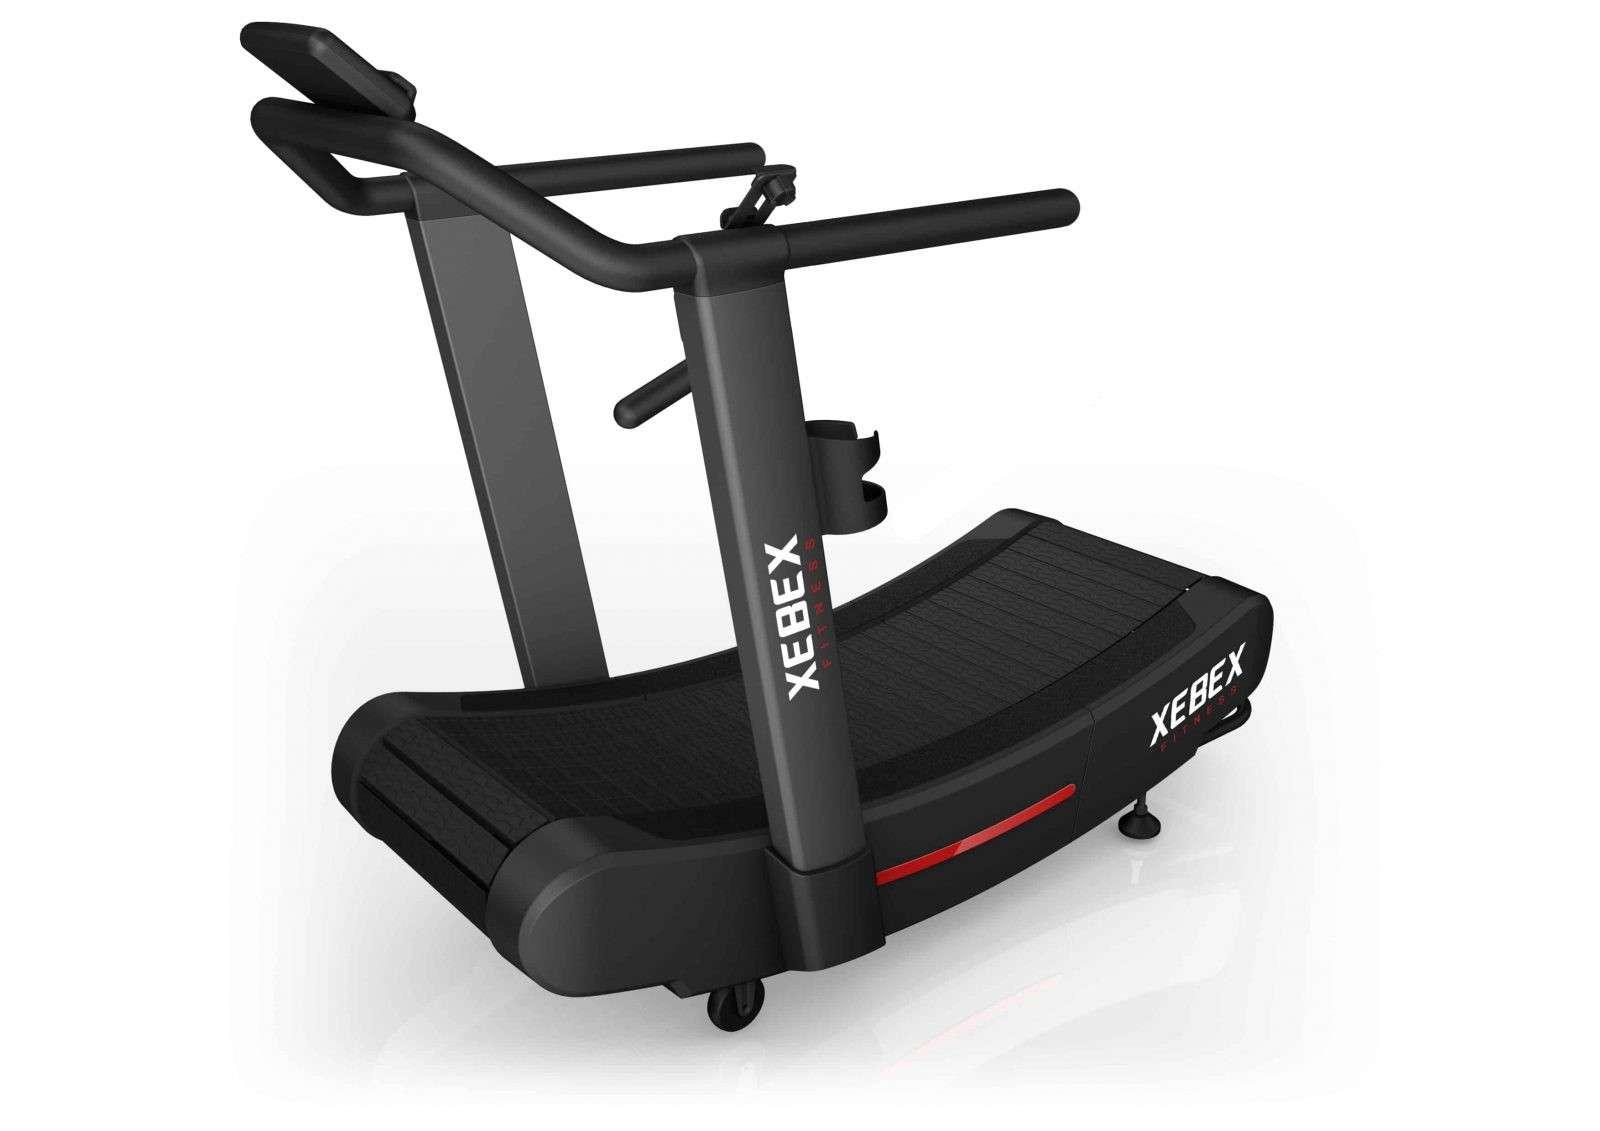 tapis de course runner xebex best fitness. Black Bedroom Furniture Sets. Home Design Ideas